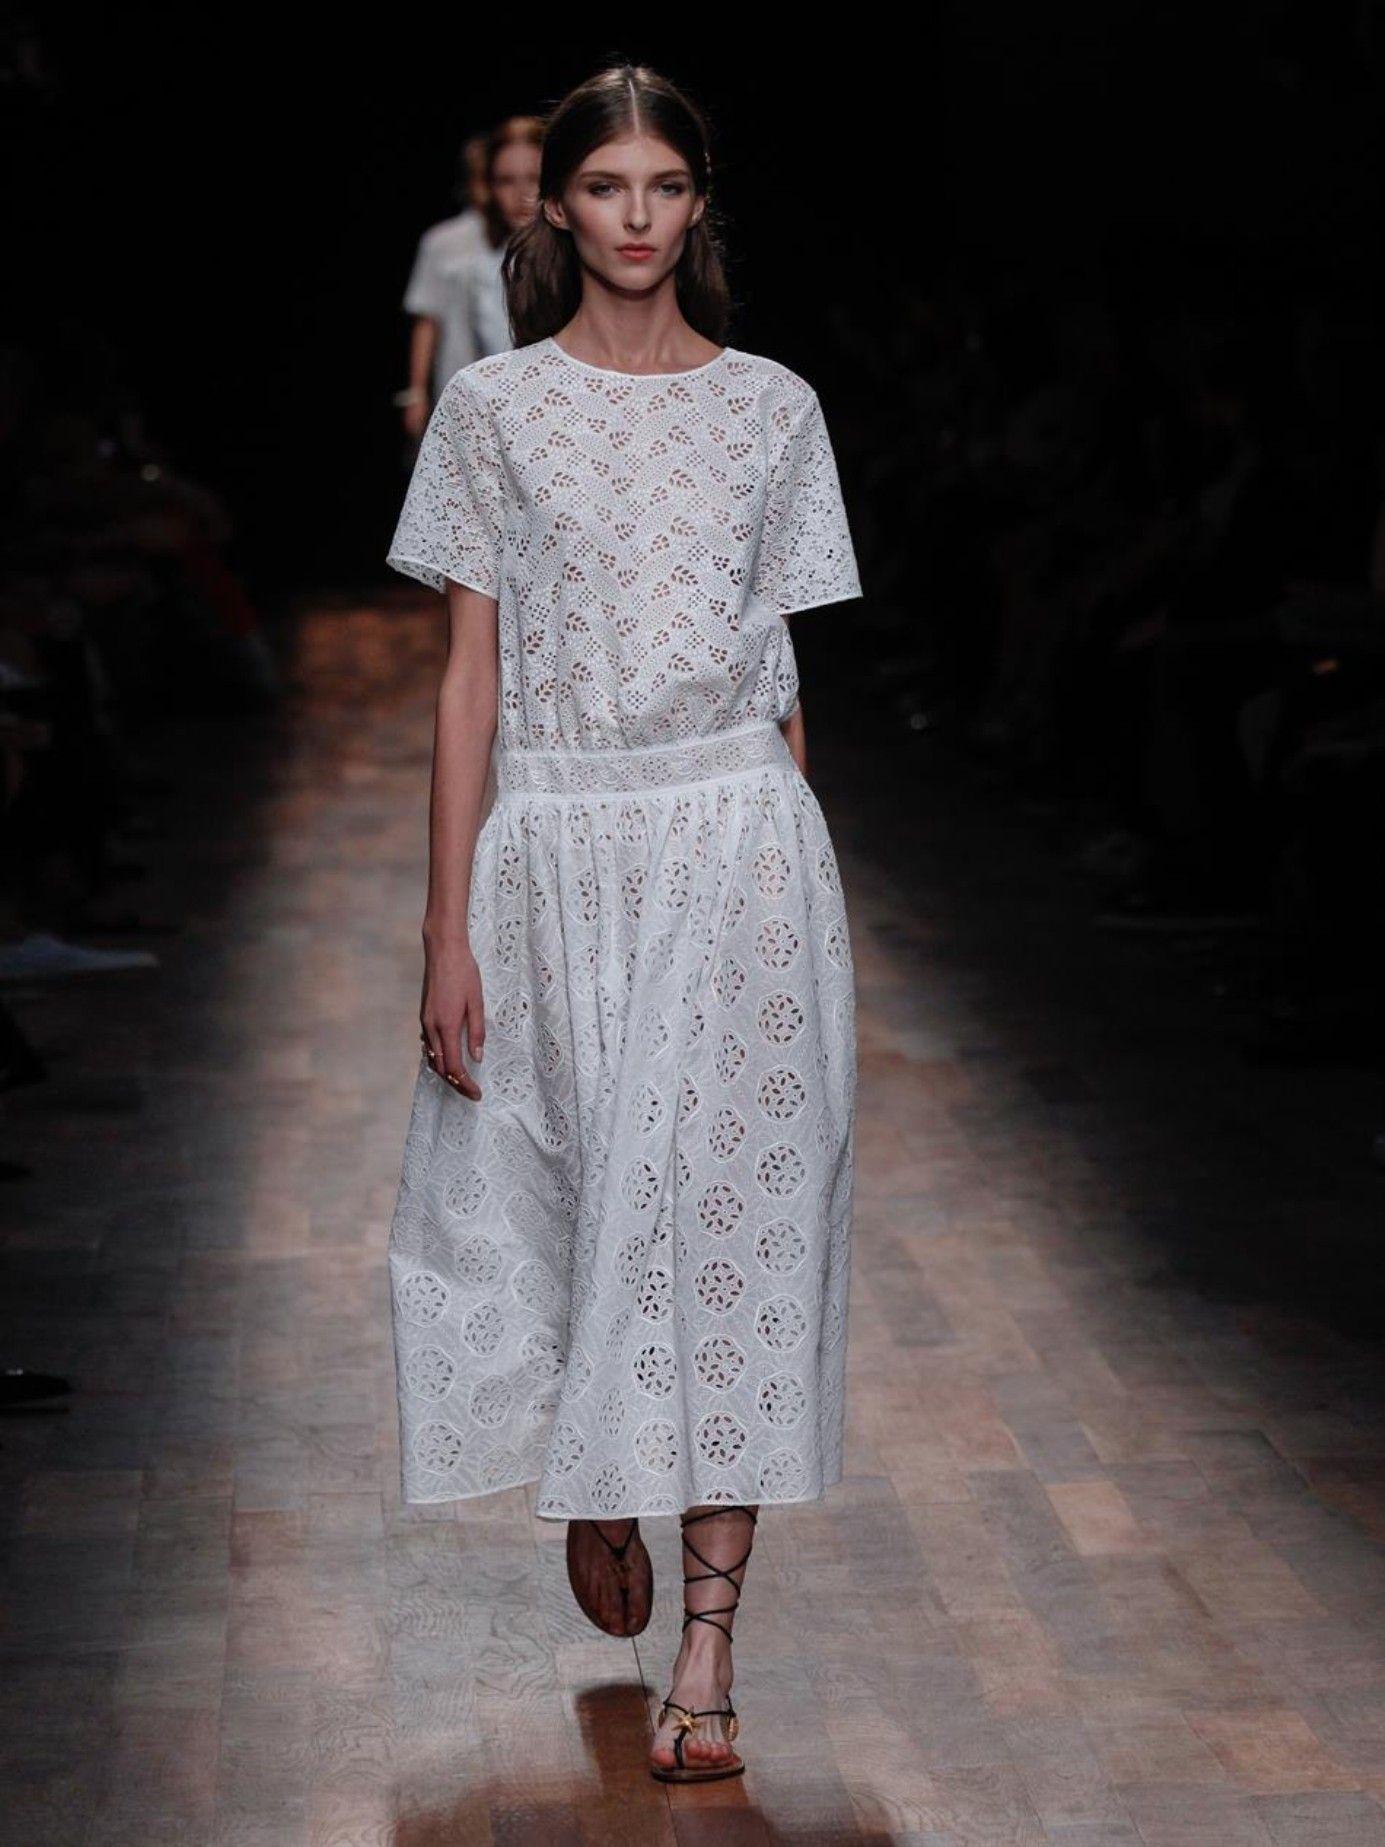 981e7e5ce6be Sangallo-lace midi dress